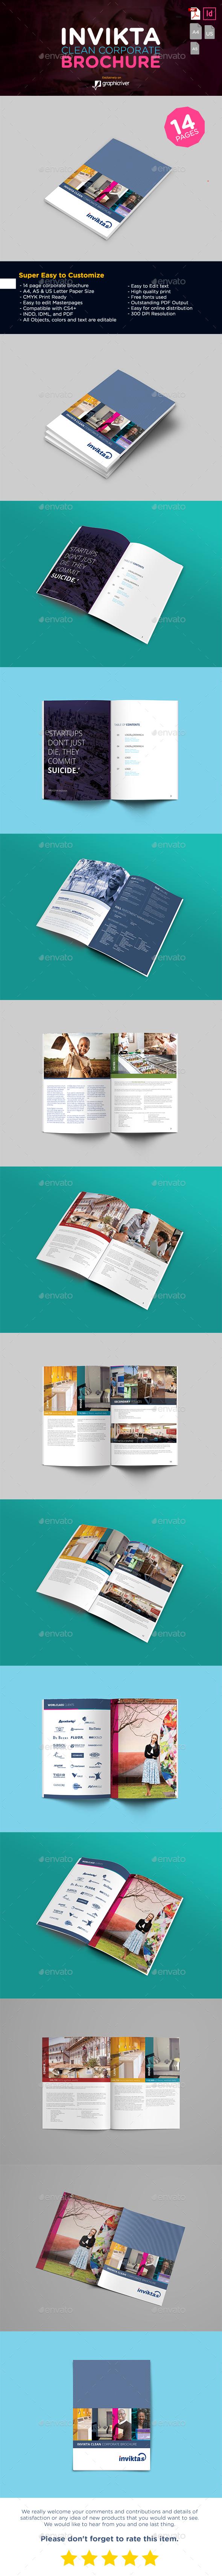 Invikta Clean Corporate Brochure Template - Corporate Brochures